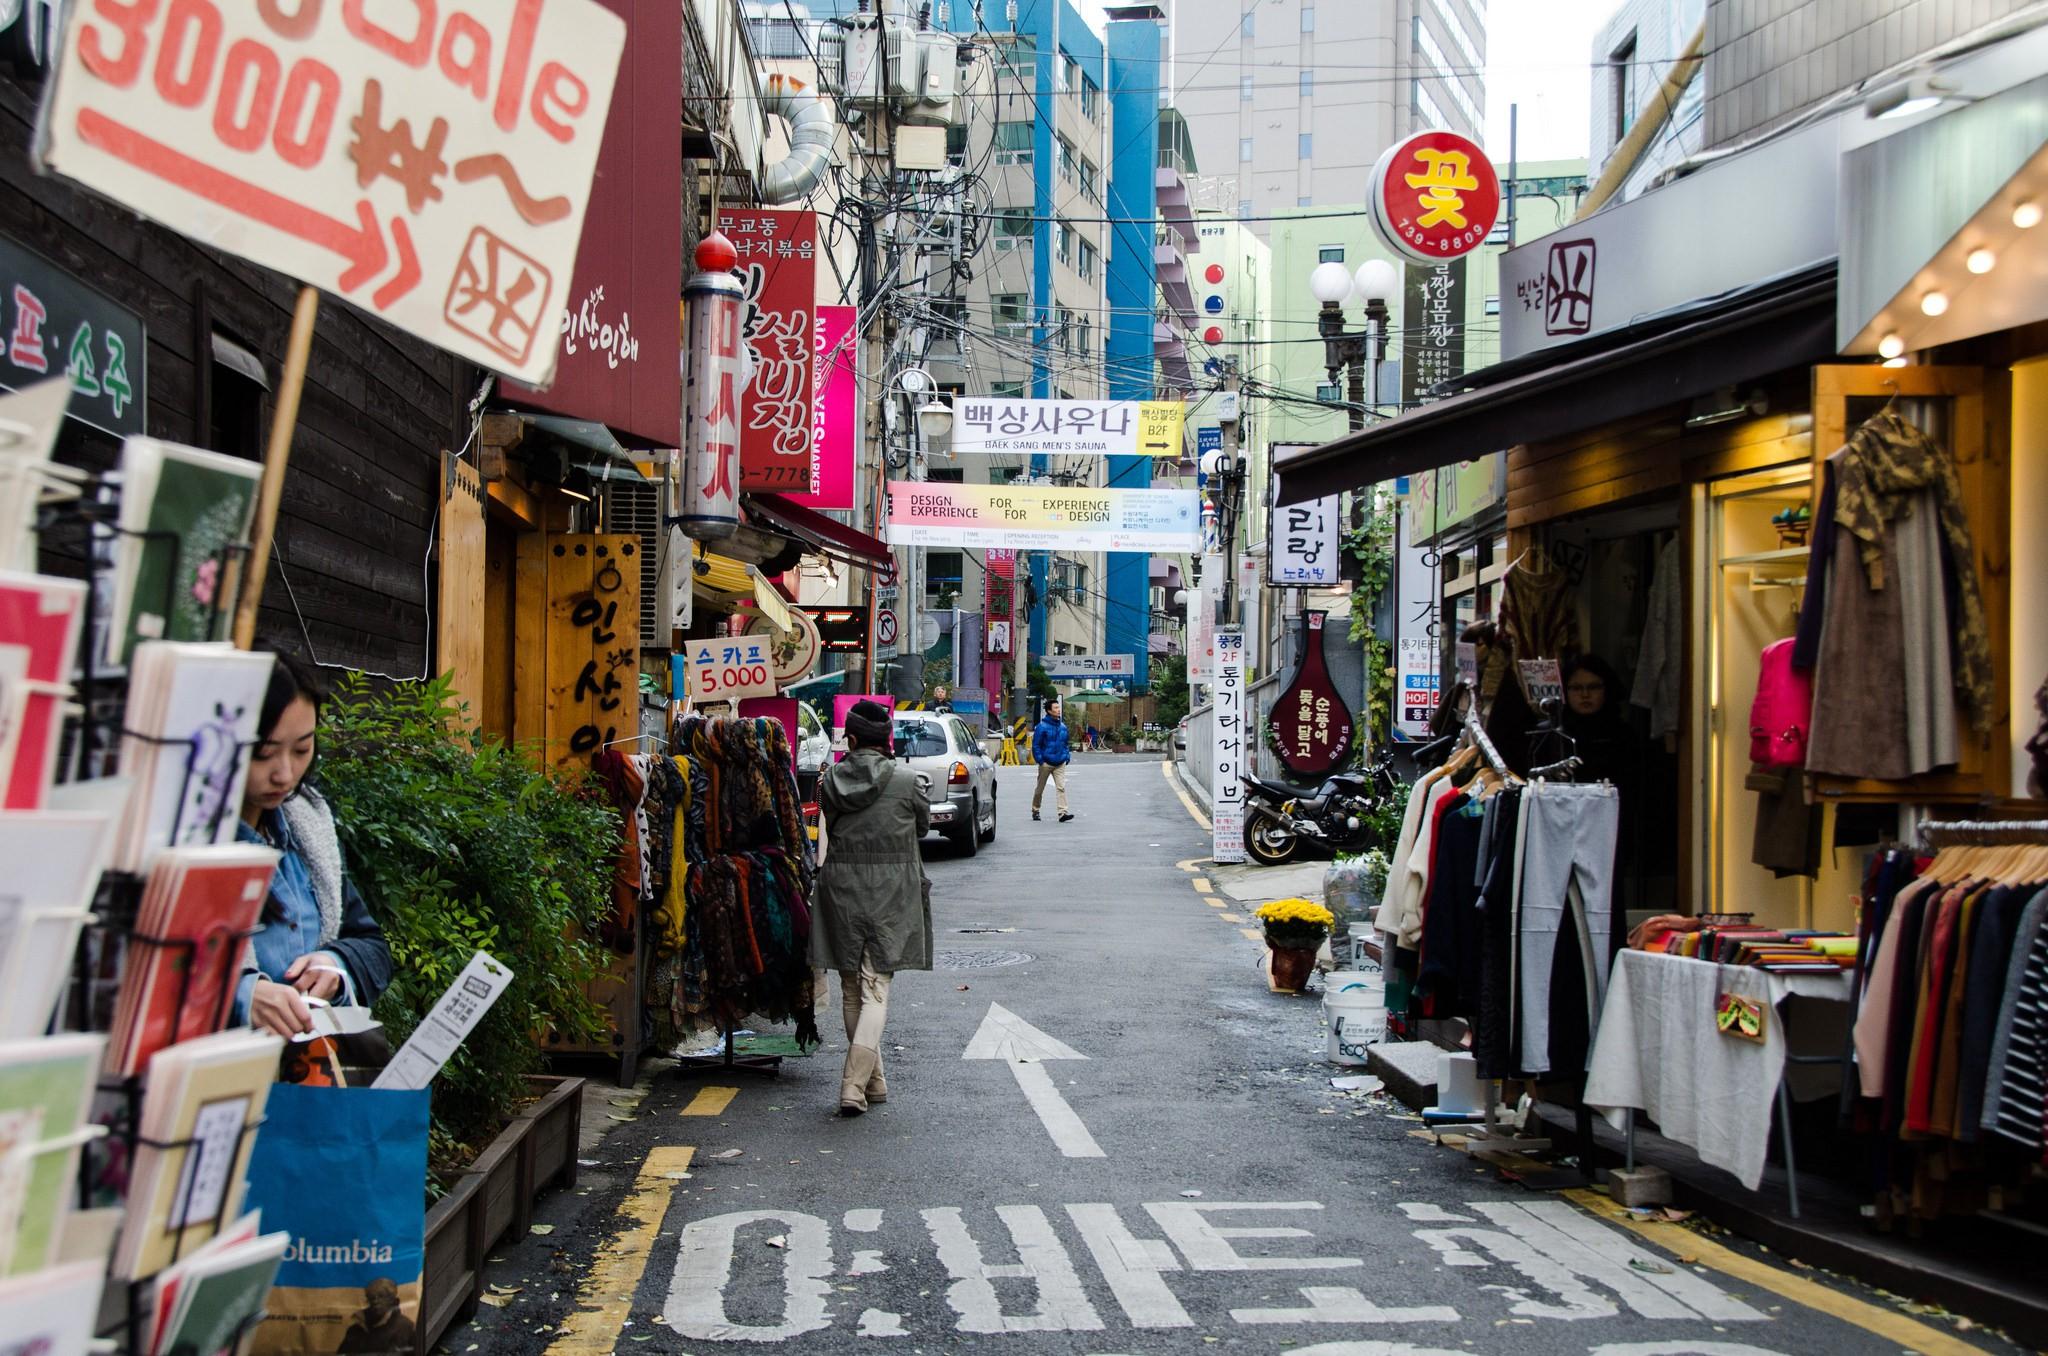 15 Korean Phrases You Need to Know